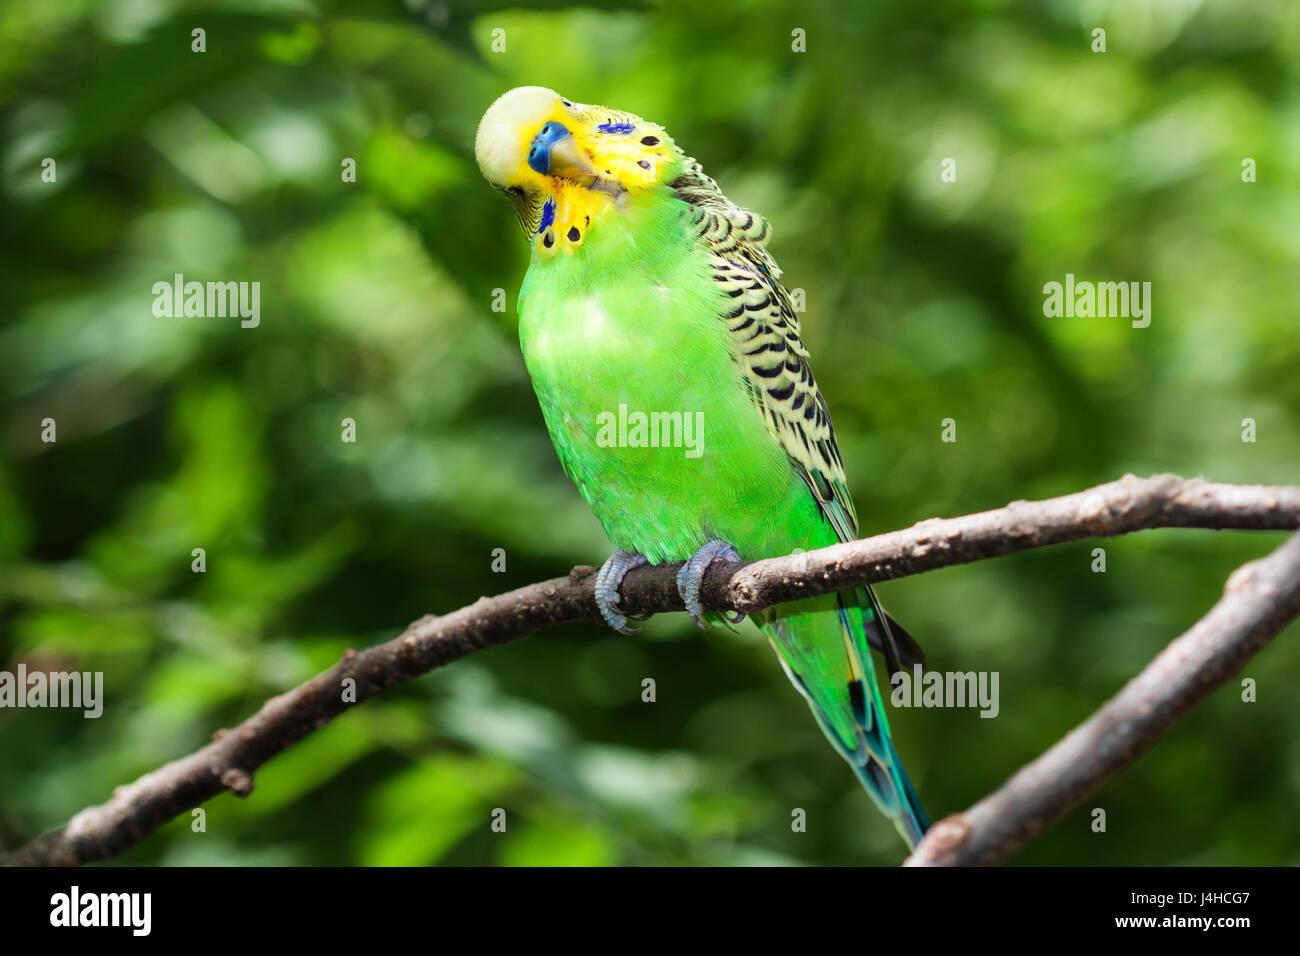 Green Budgerigar (Melopsittacus undulatus) sitting on a branch. - Stock Image